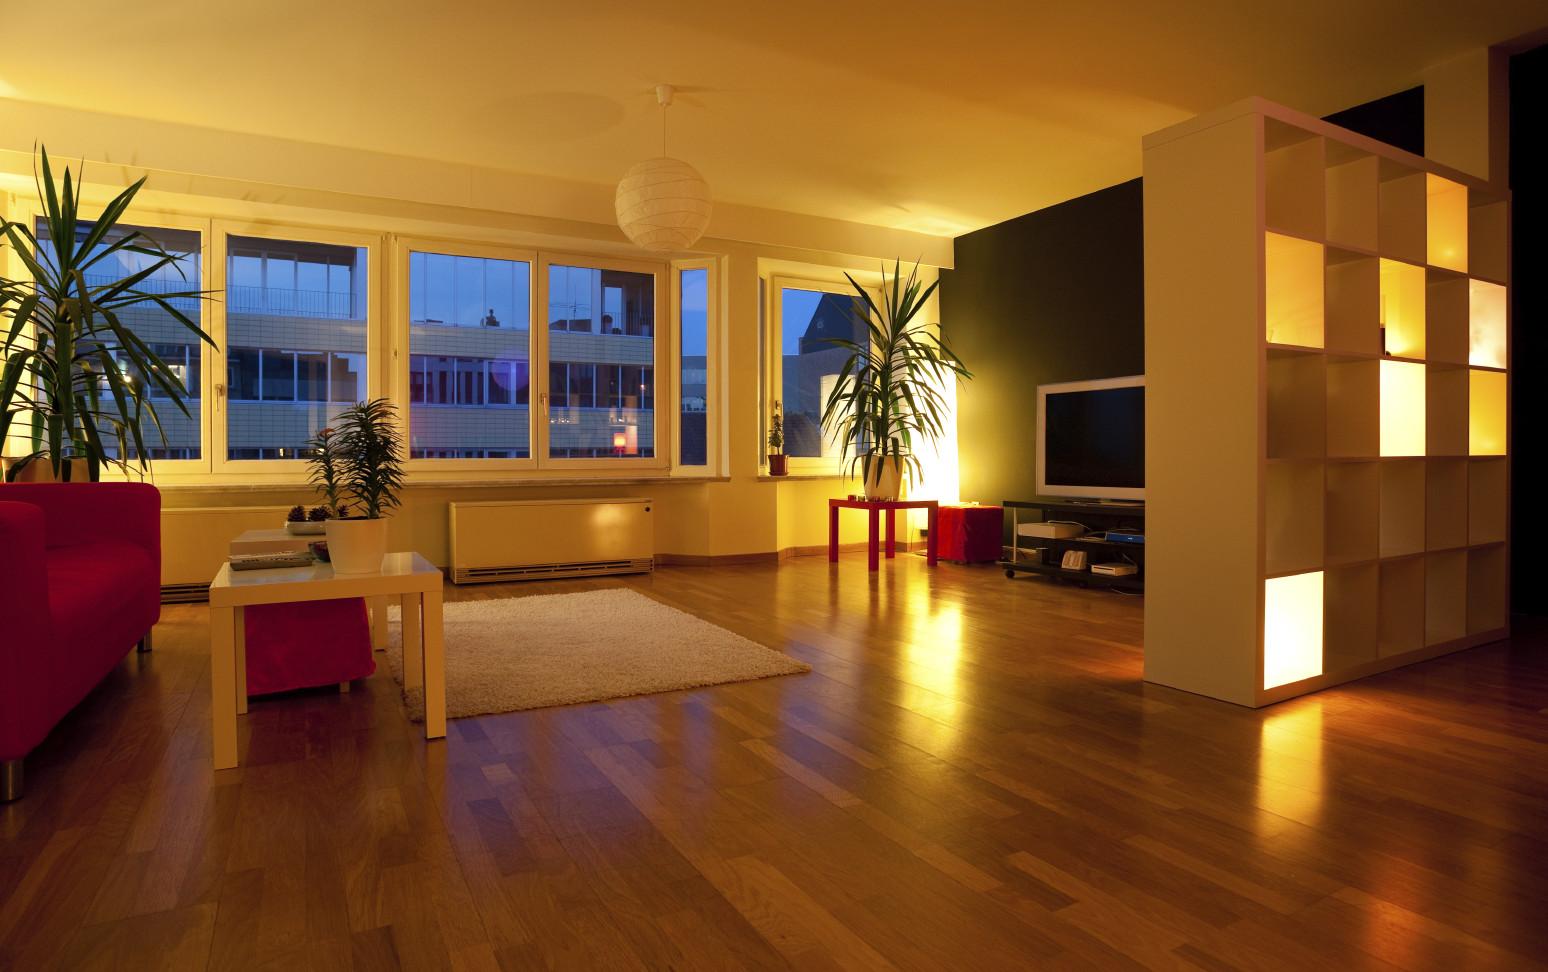 Full Size of Led Indirekte Beleuchtung Fürs Wohnzimmer Indirekte Beleuchtung Für Wohnzimmer Indirekte Beleuchtung Wohnzimmer Fenster Indirekte Beleuchtung Wohnzimmerschrank Wohnzimmer Indirekte Beleuchtung Wohnzimmer